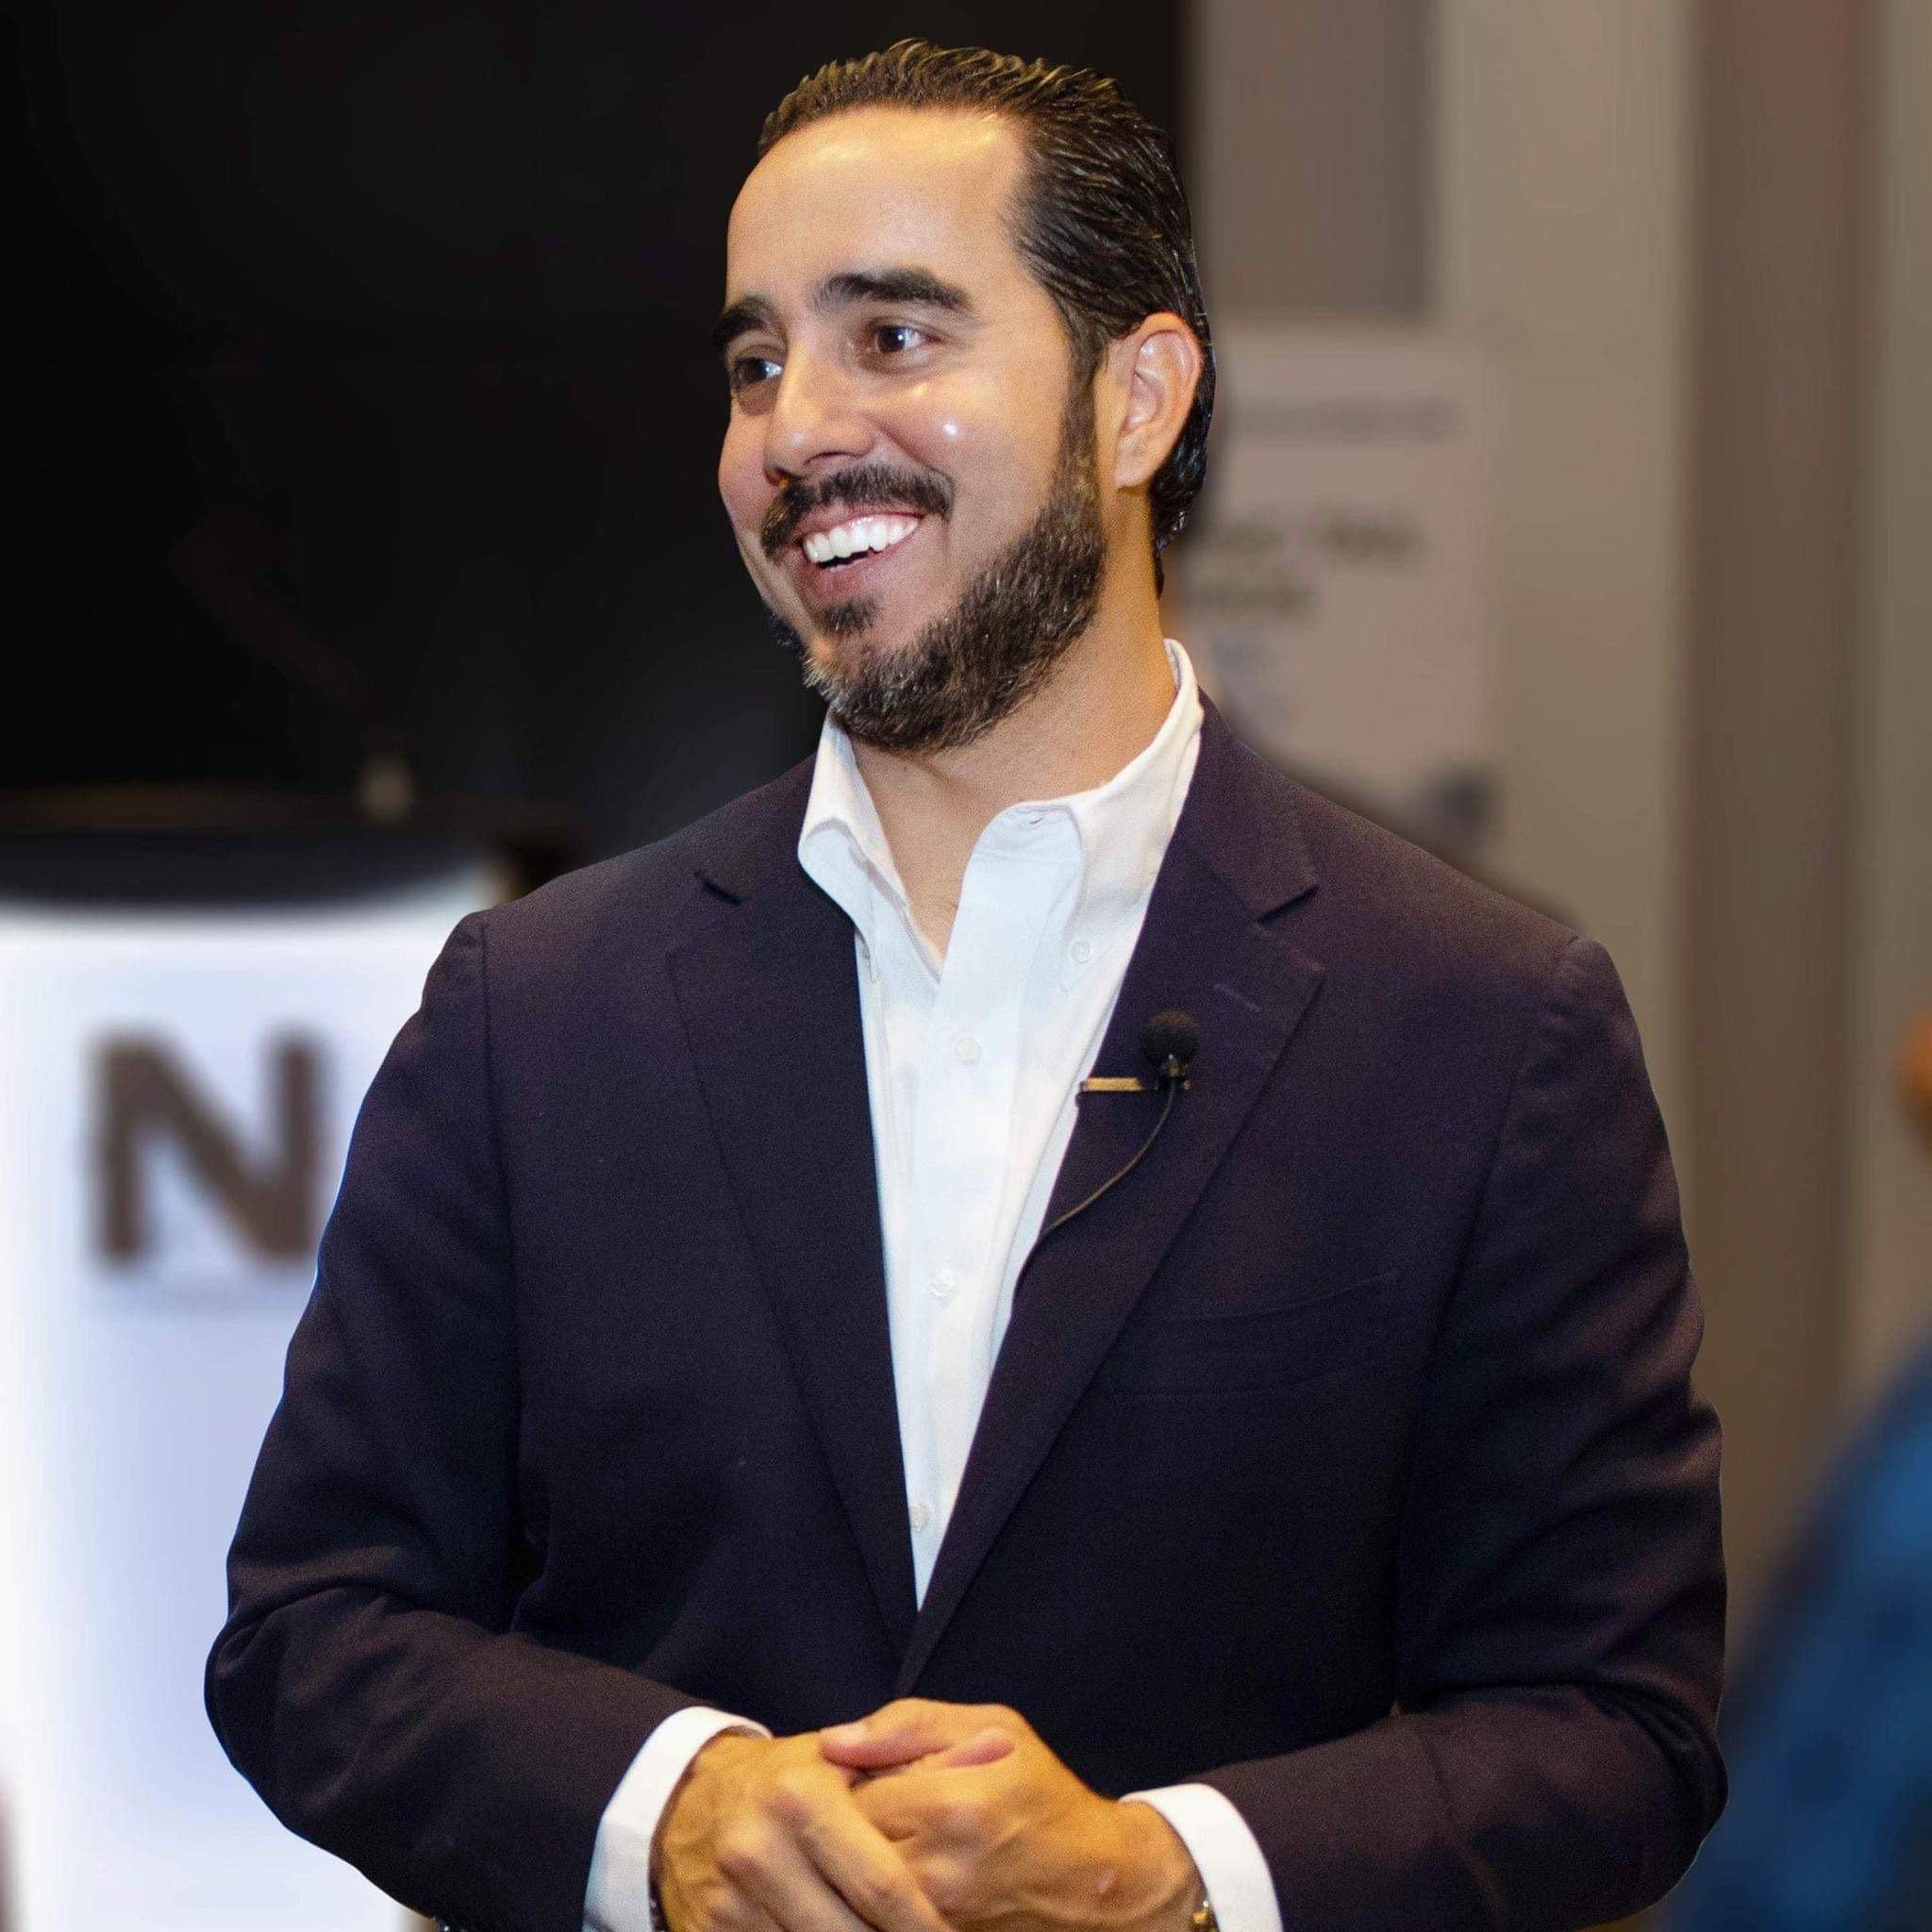 Manuel Suarez ManyChat Conference Speaker